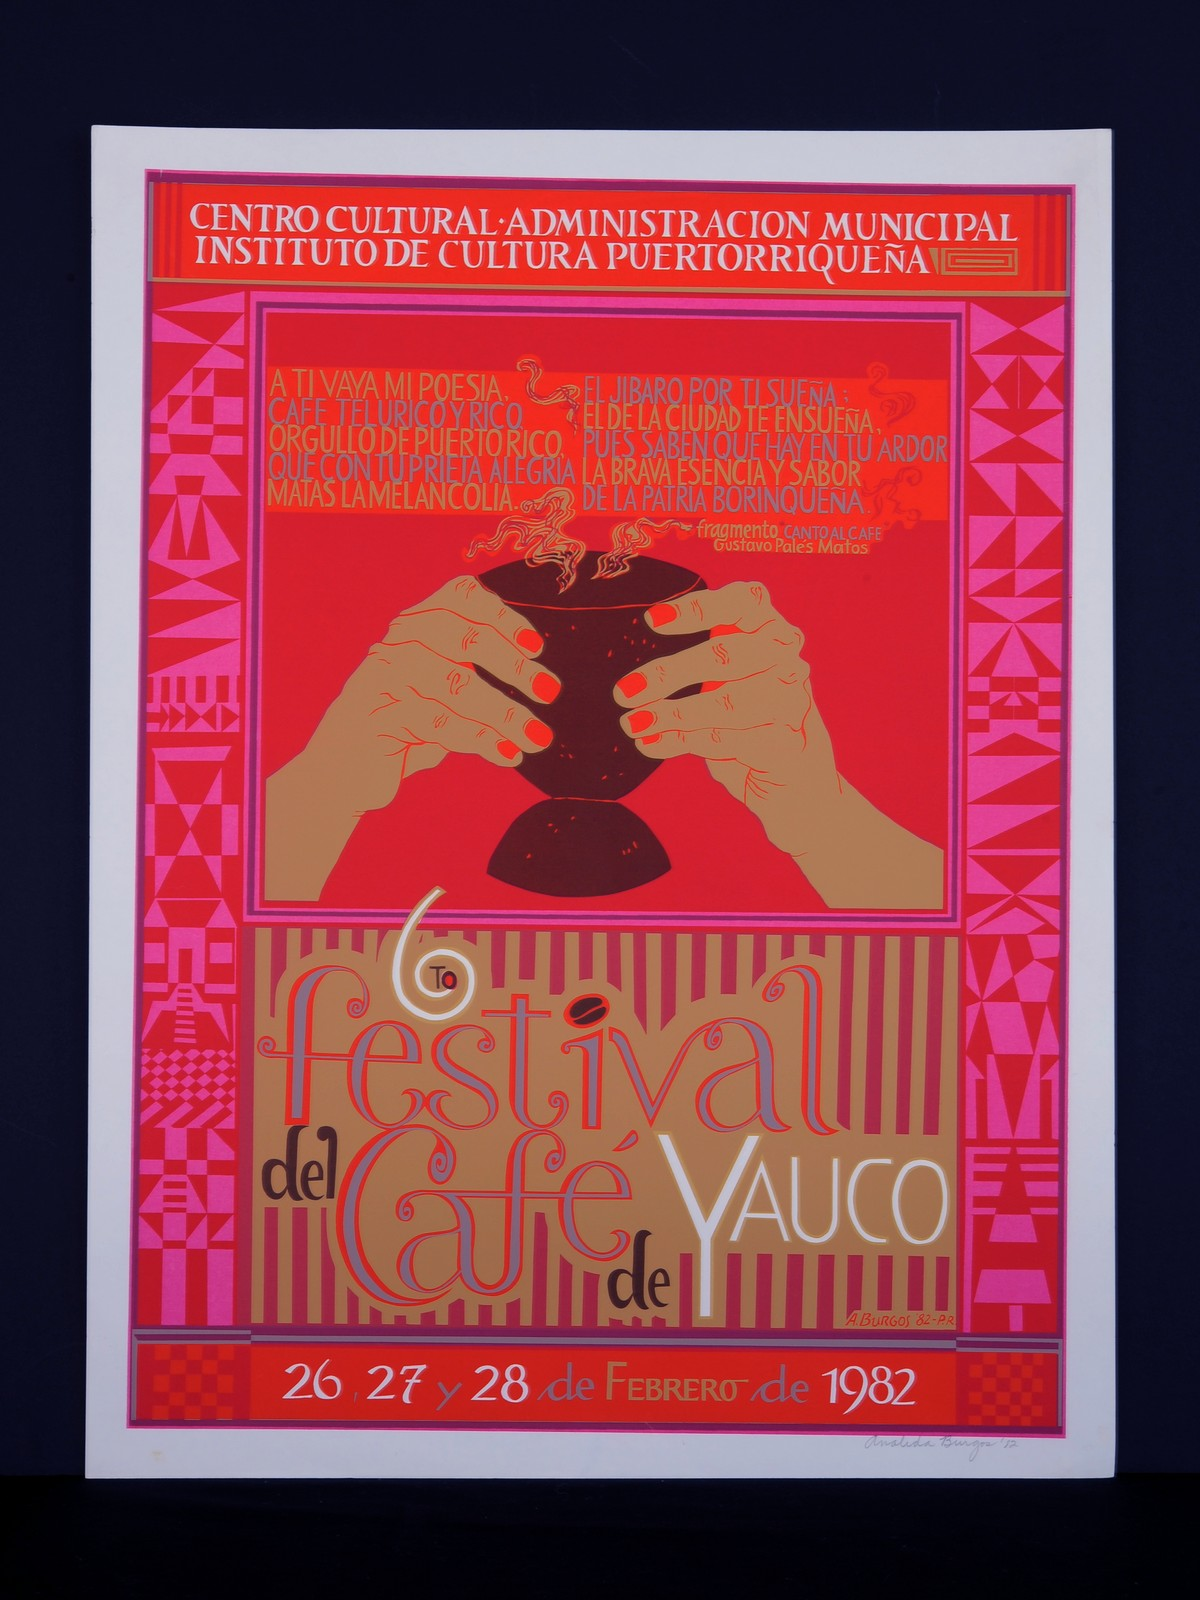 6to. Festival  del Café de Yauco